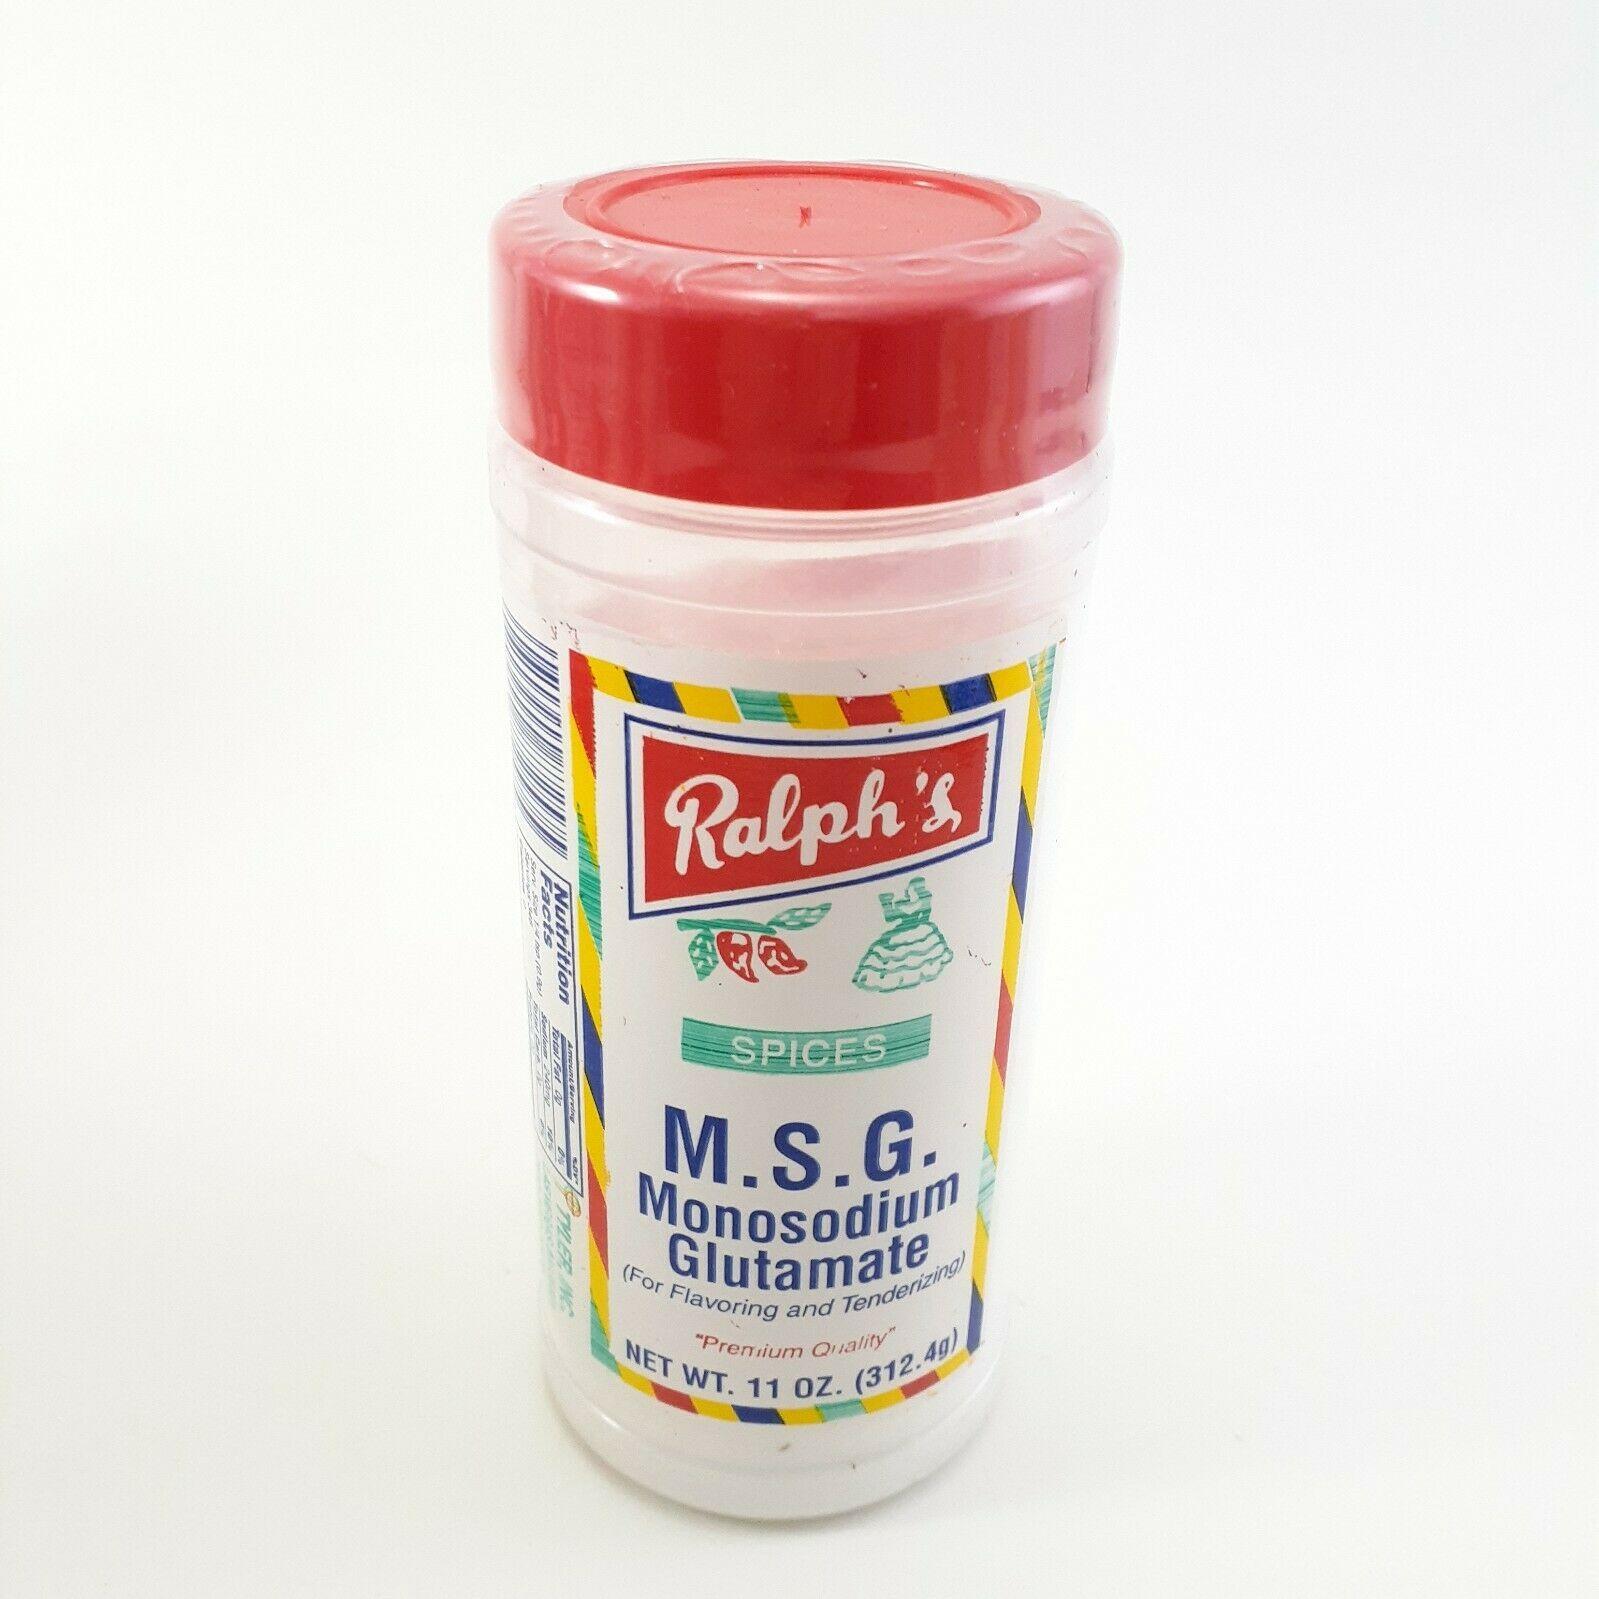 M.S.G.  Ralph's Spices Premium Quality